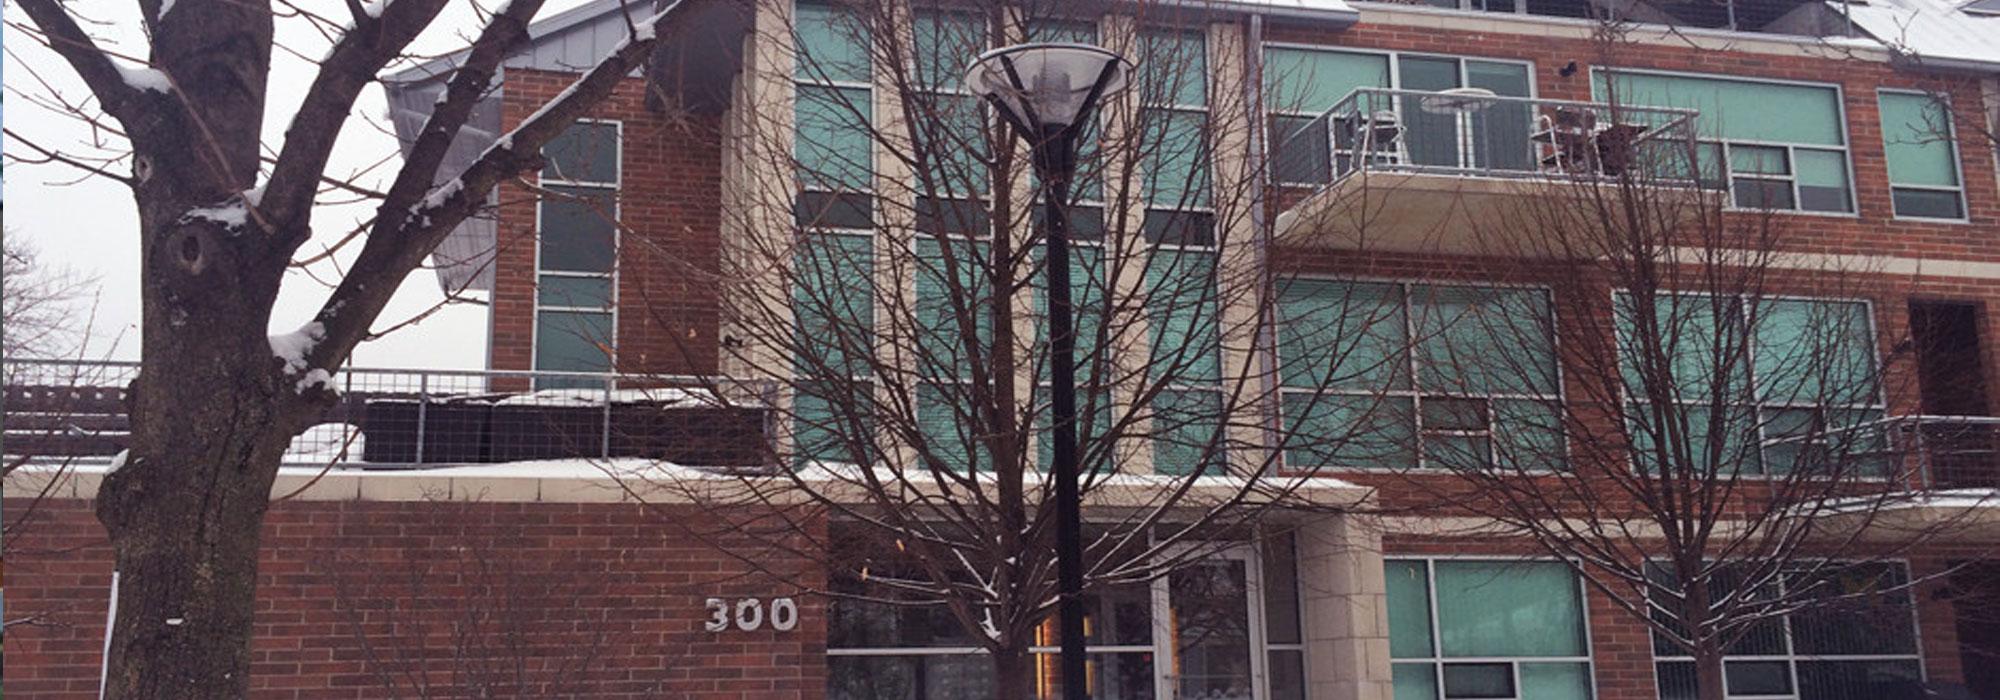 300 Hamilton St. Unit #304